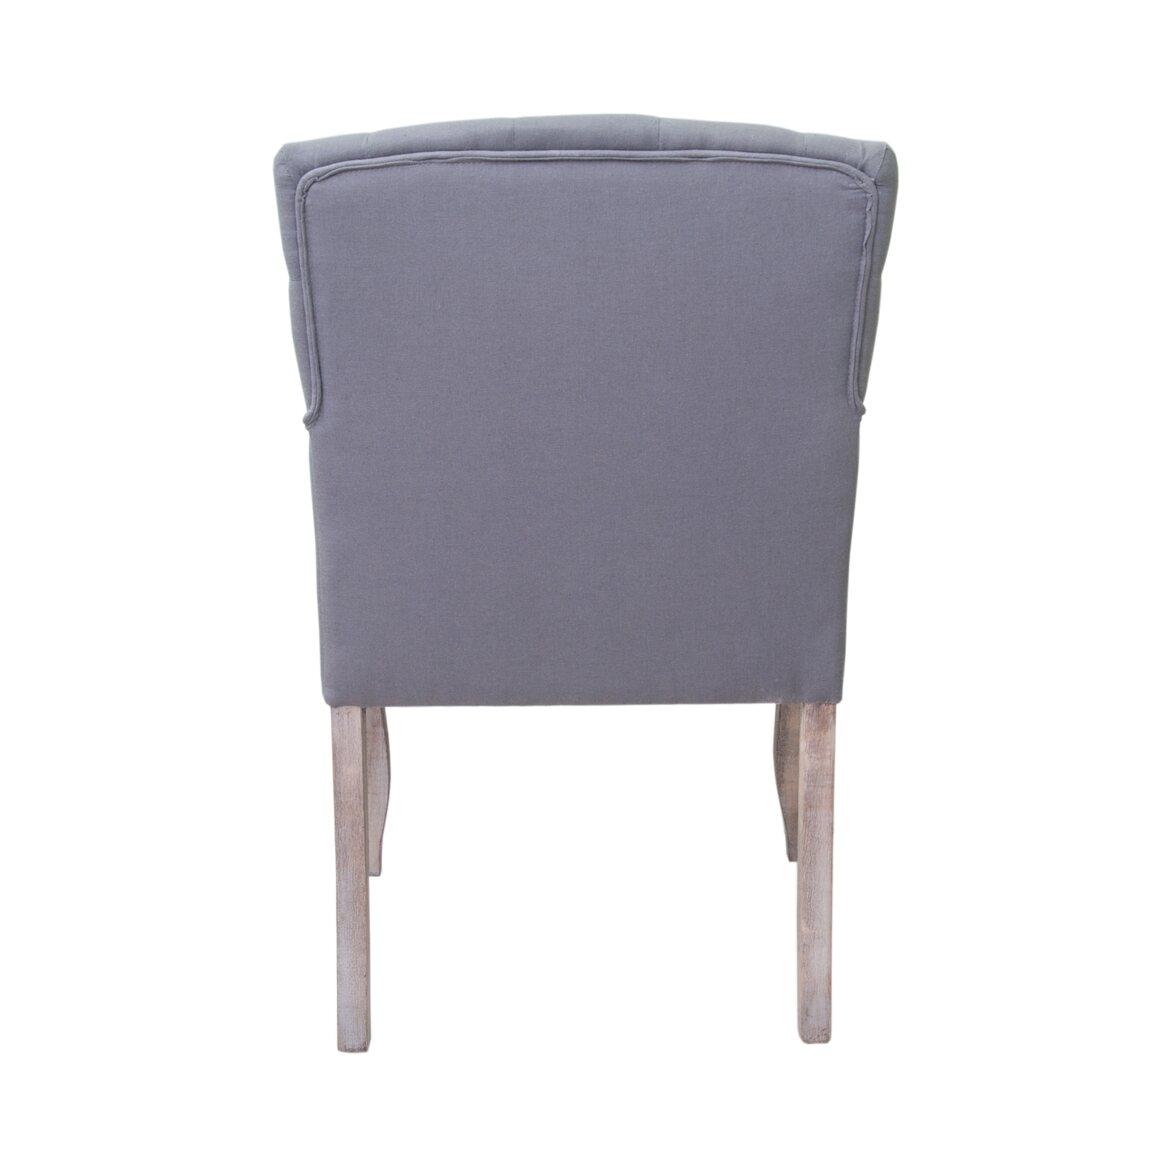 Кресло Deron grey ver.2 3 | Кресло-стул Kingsby